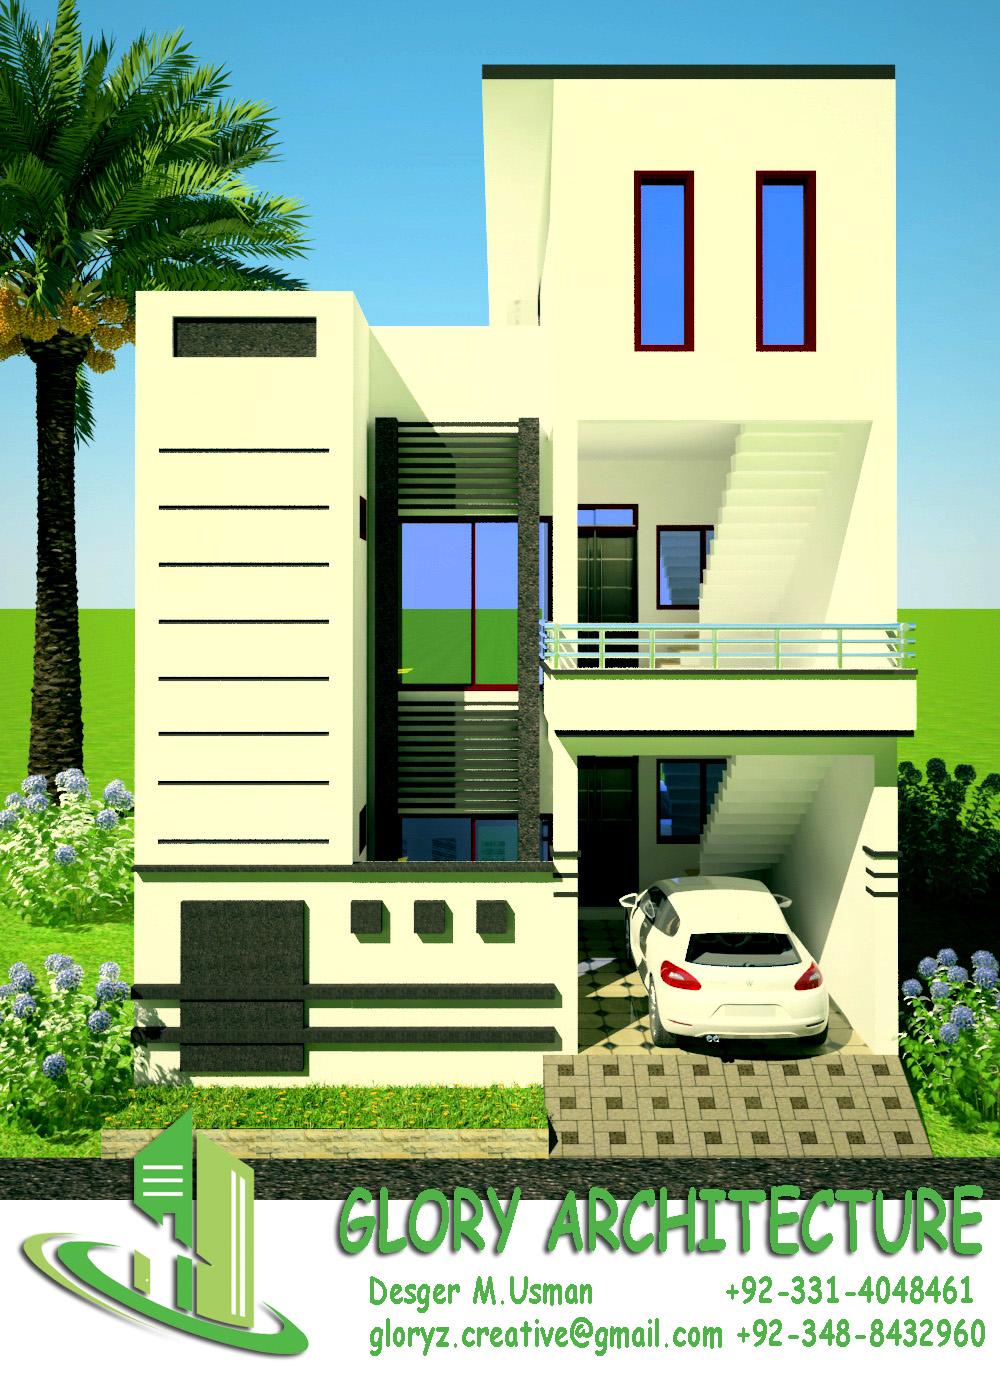 Why choose Houseplans?